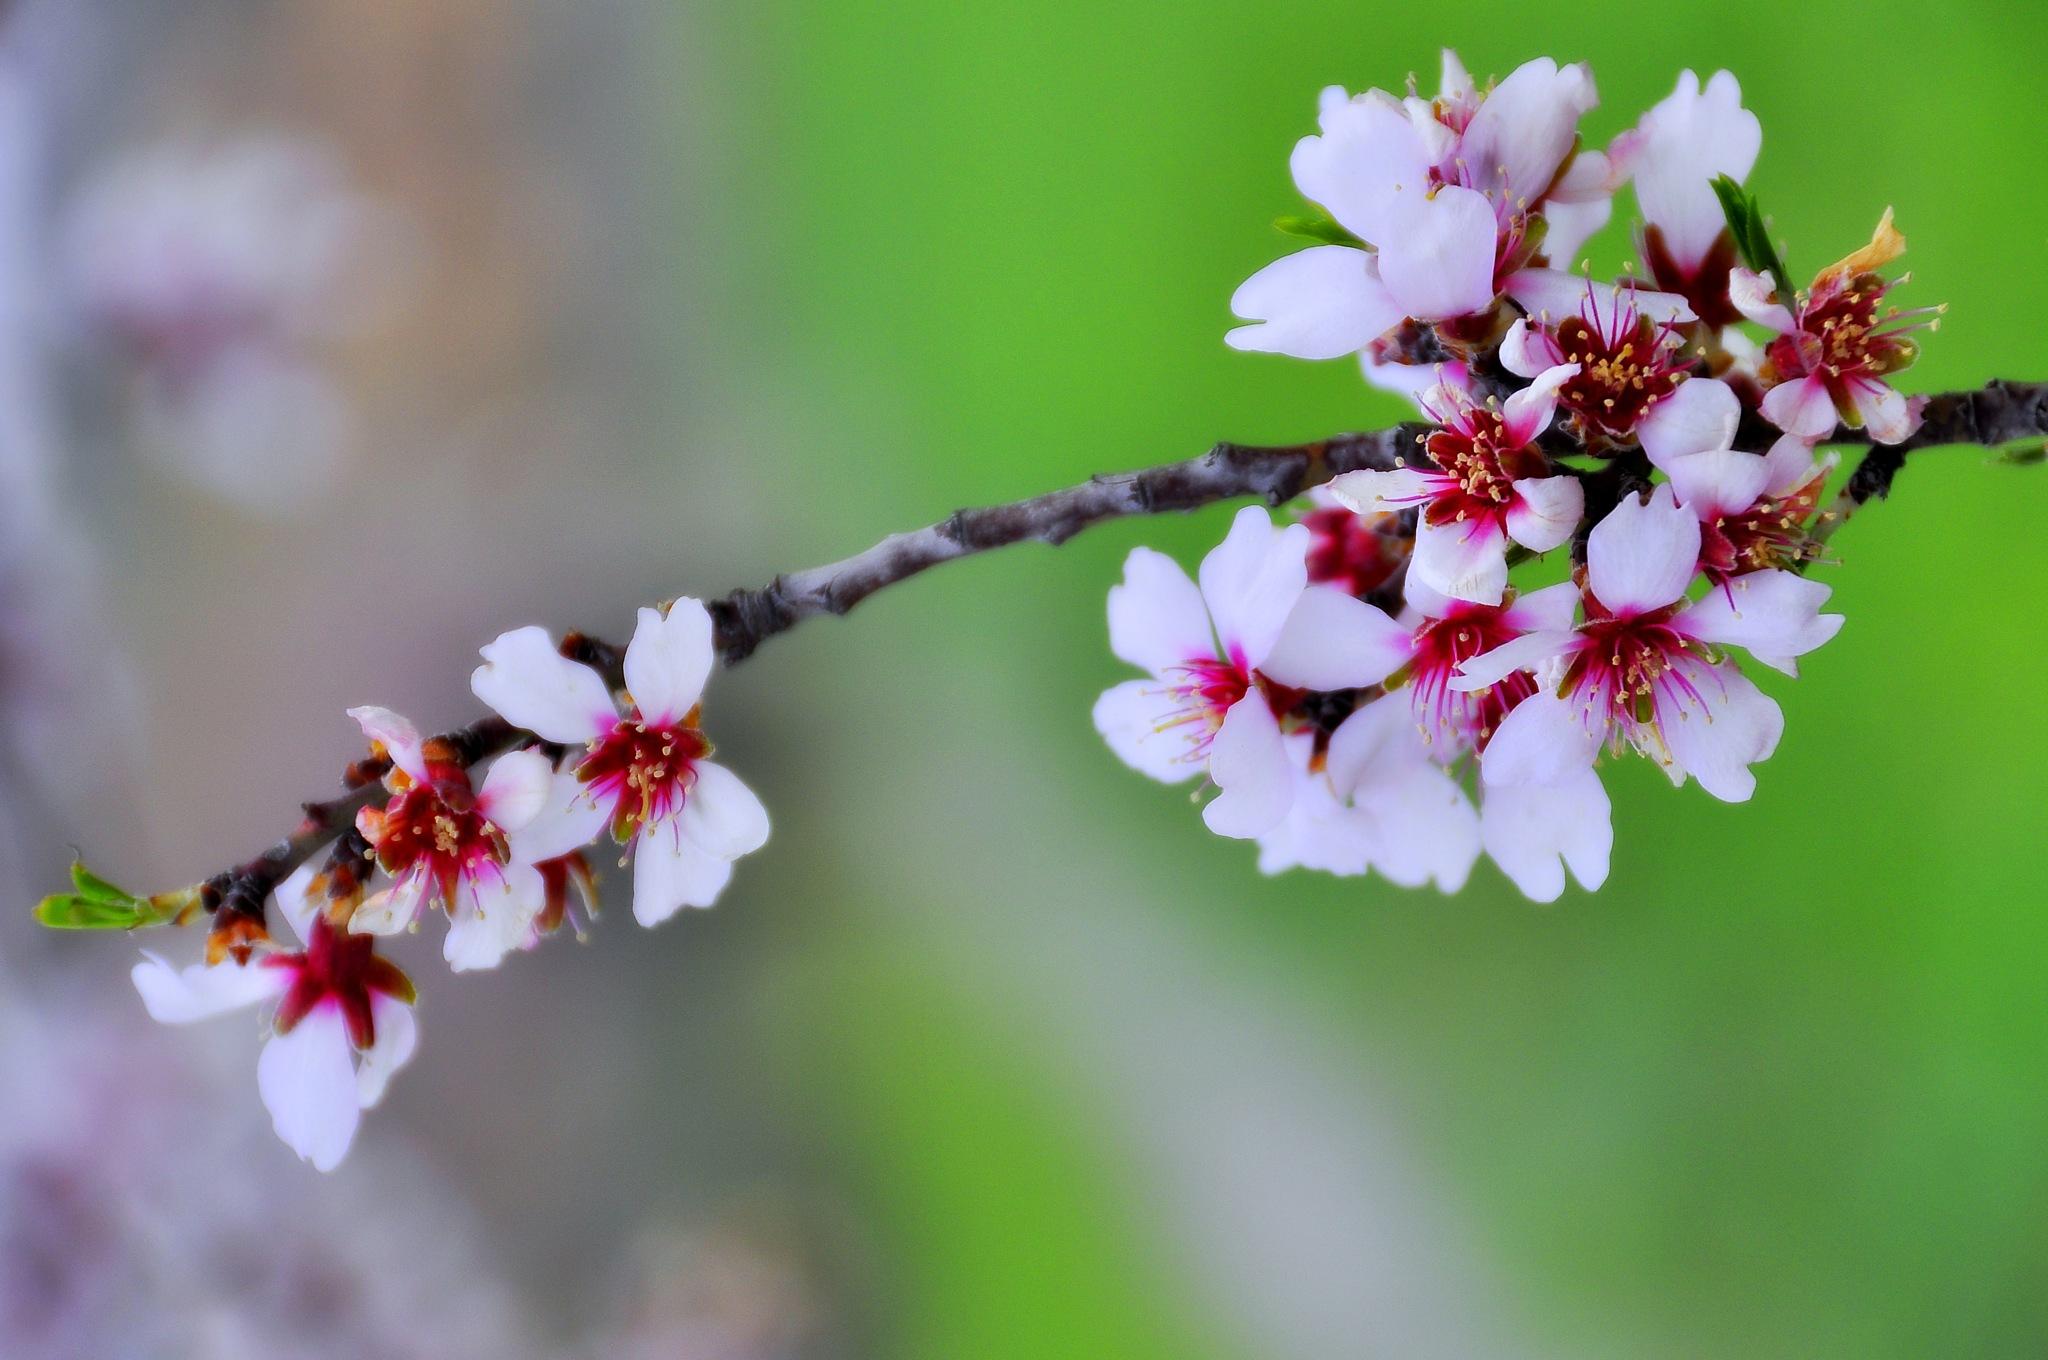 primavera by angelgarcia